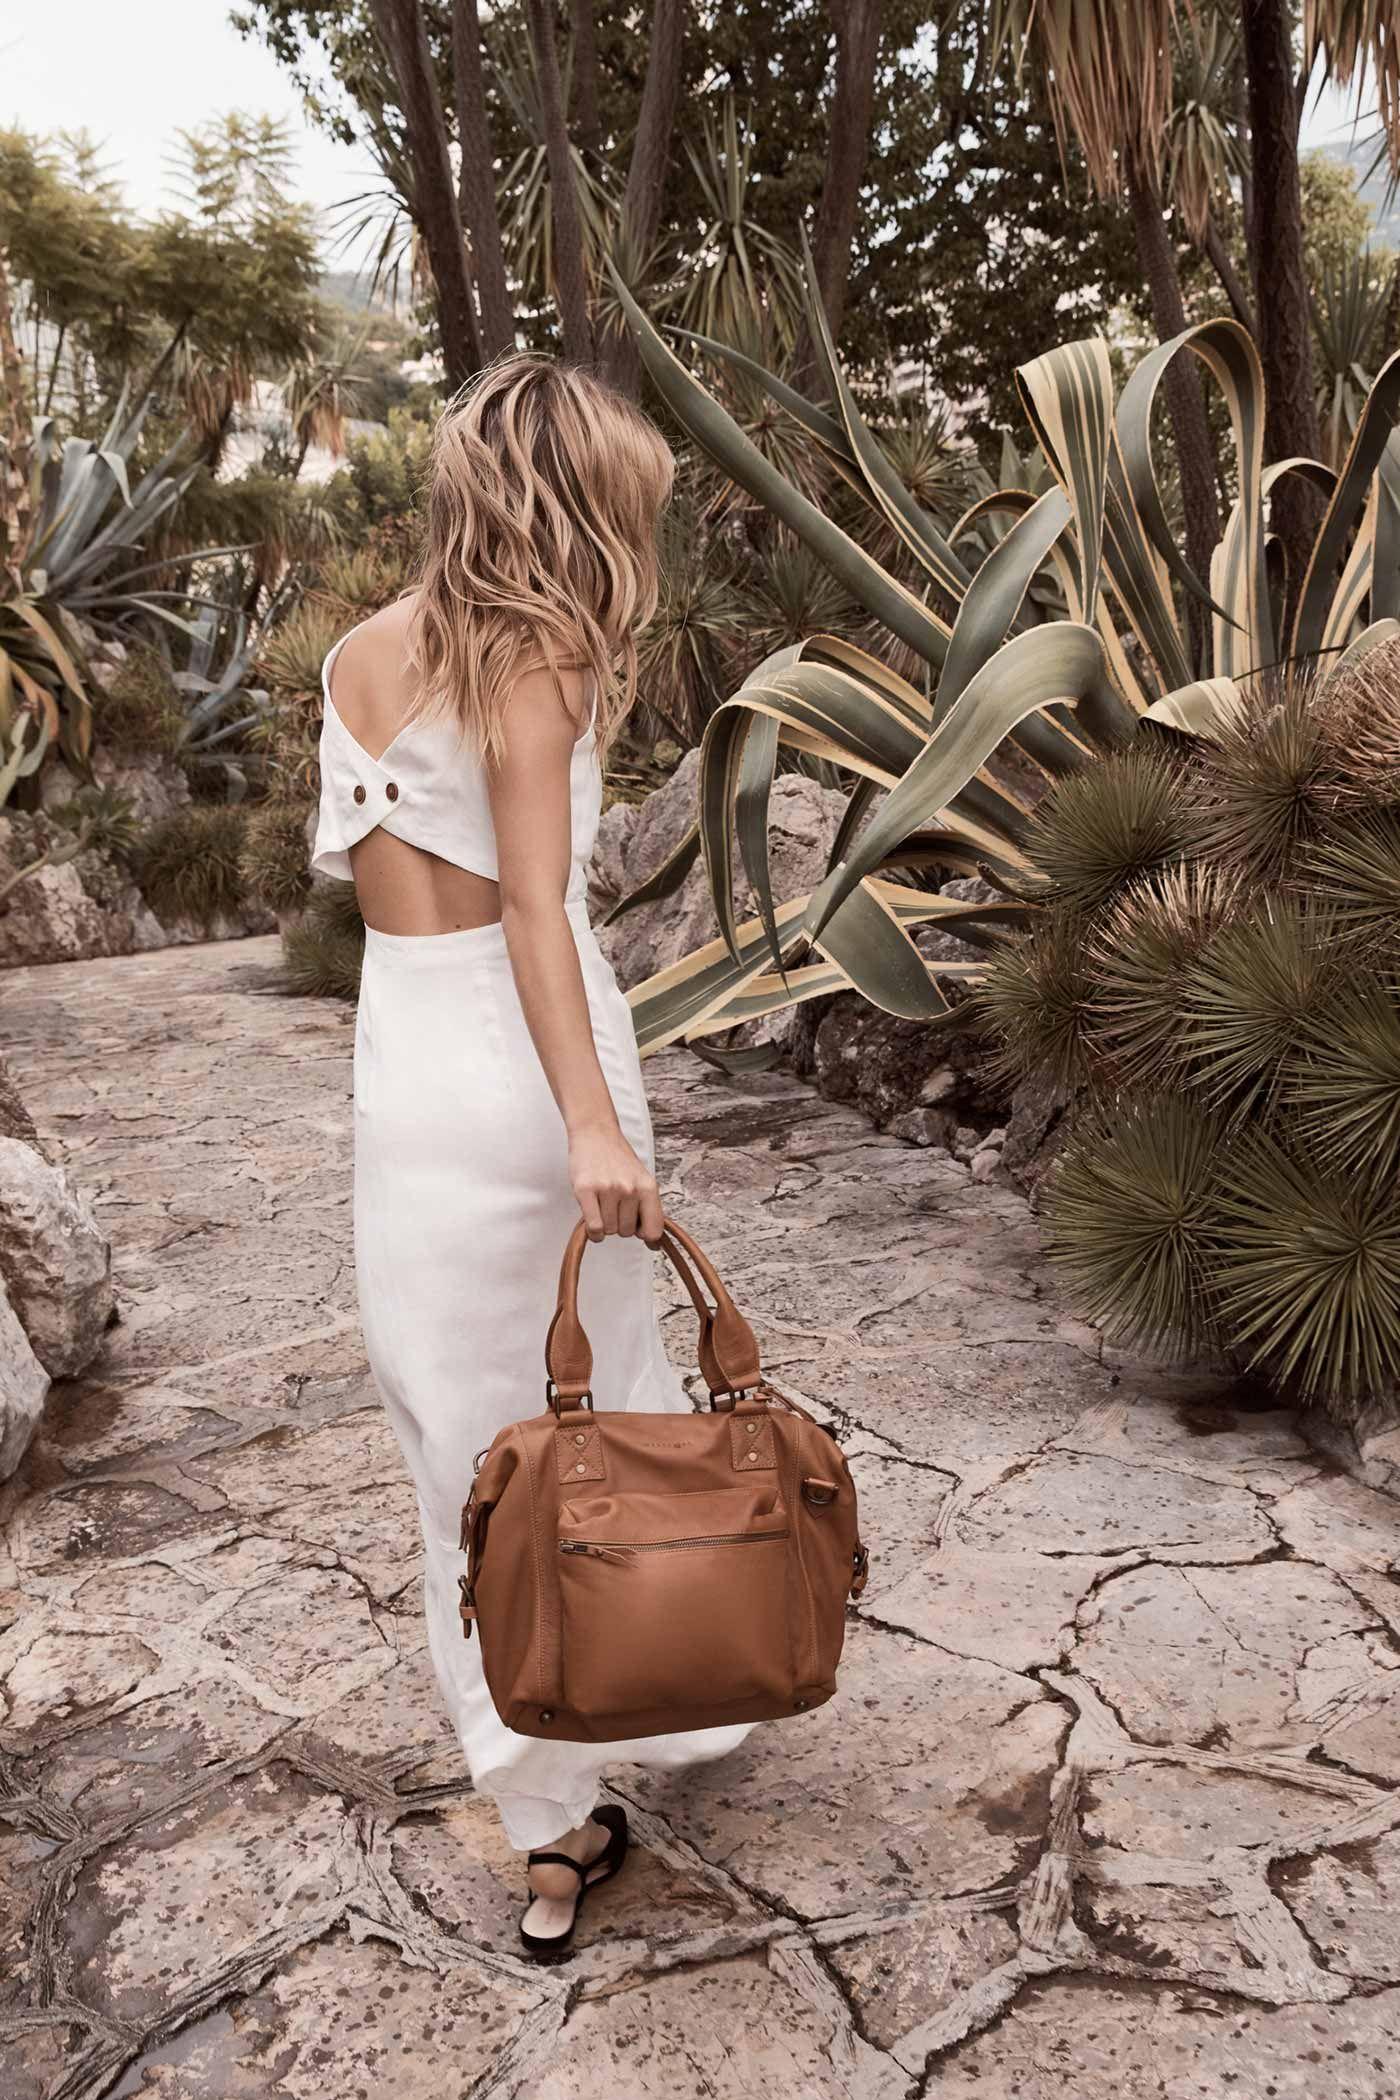 f0481087f31c7 The Praiano Handbag in Tan, by Wanderers Travel Co.  wandererstravelco.com/products/the-praiano-handbag